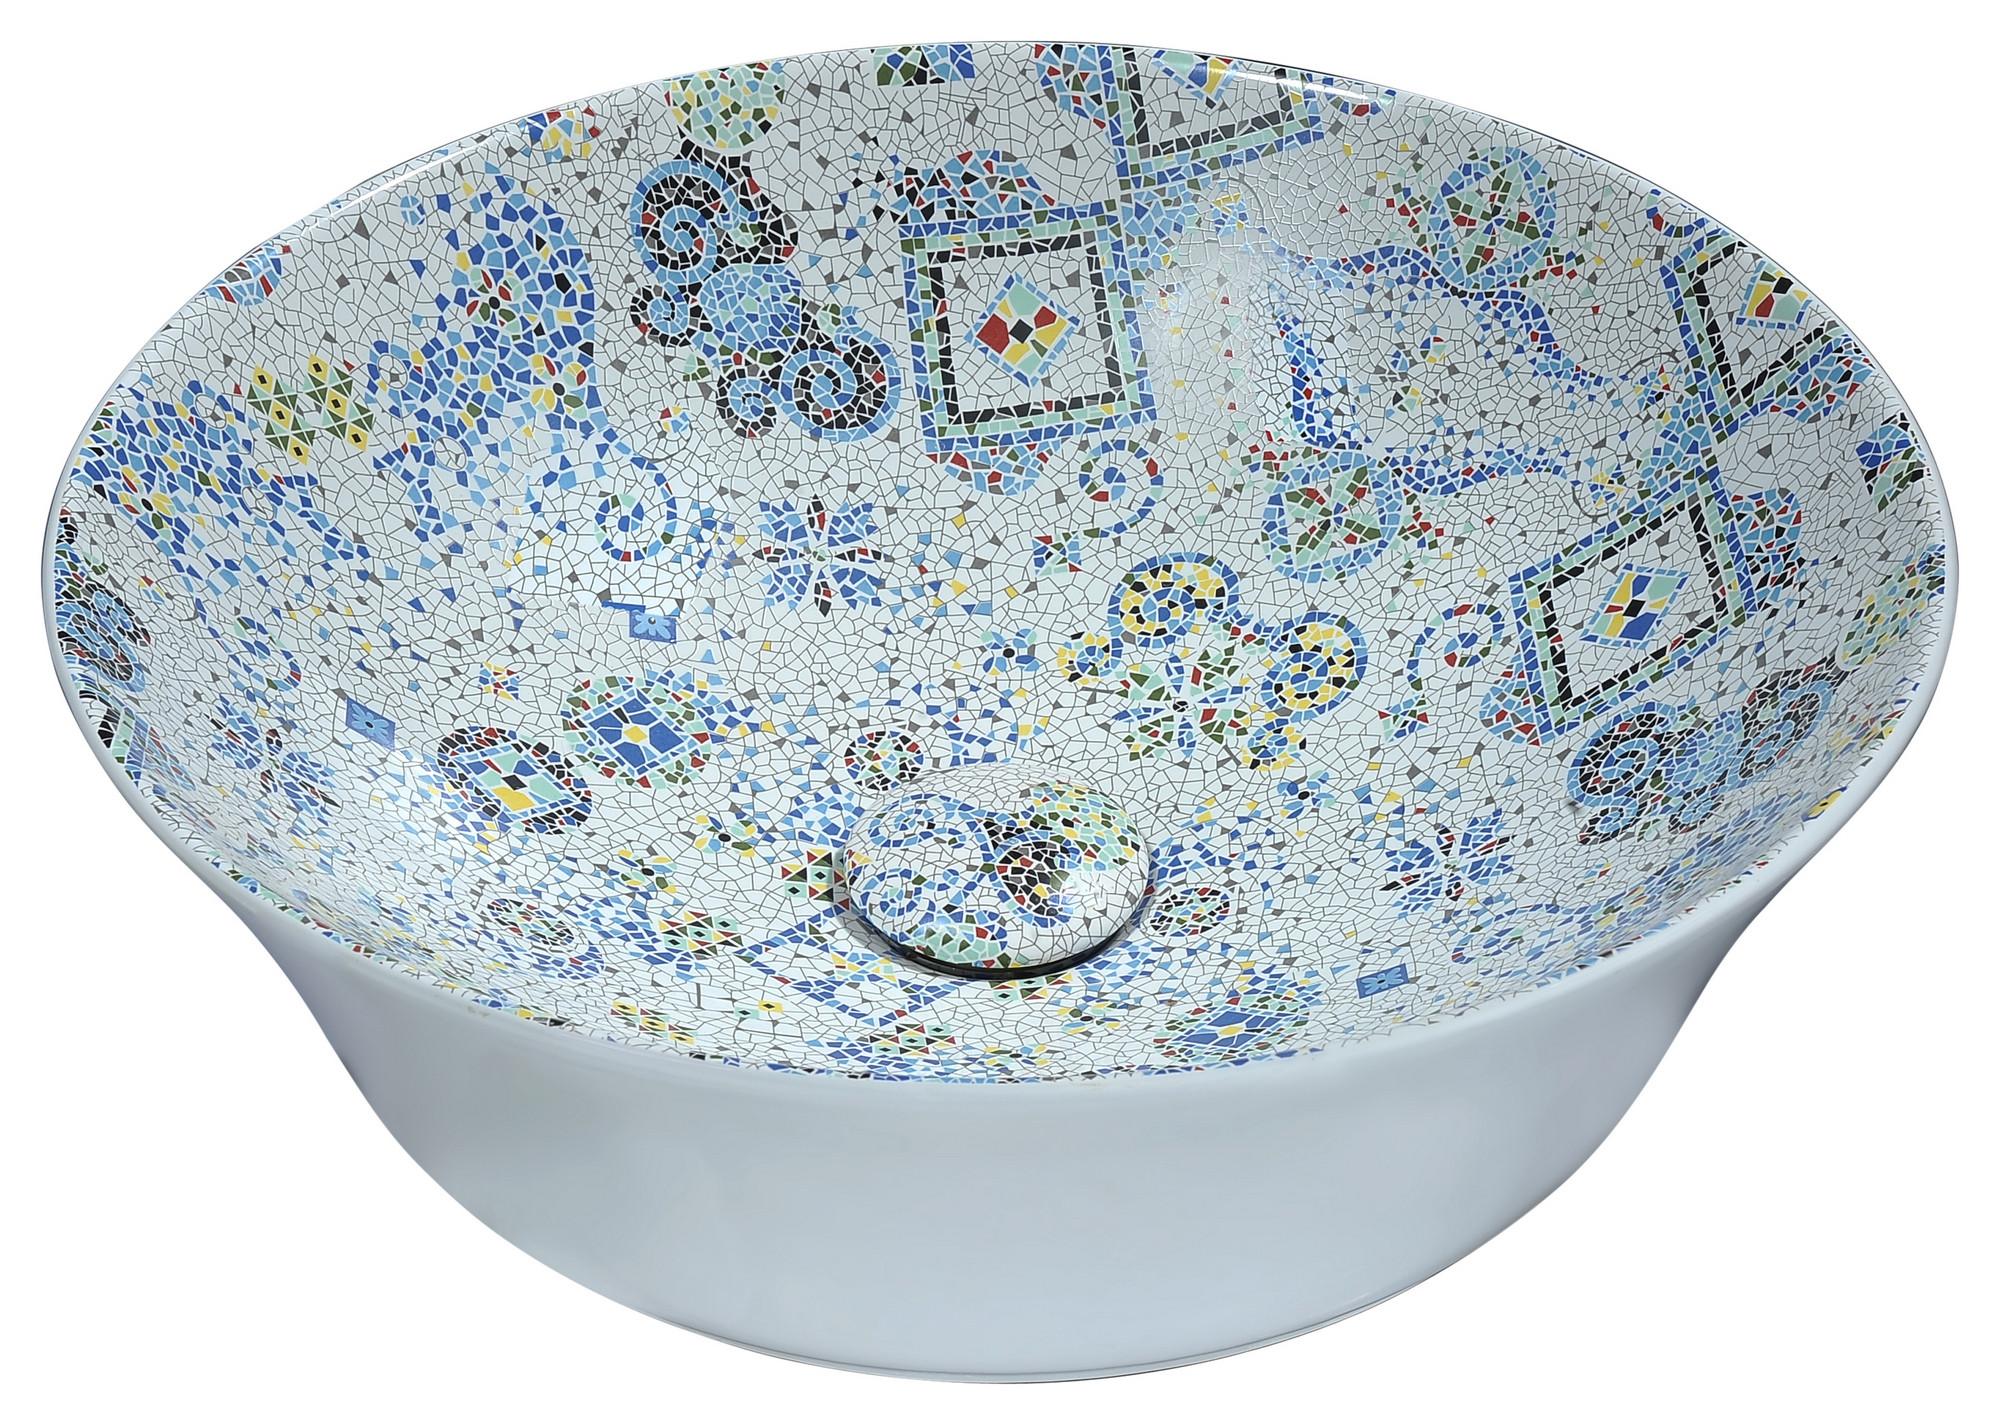 ANZZI LS-AZ260 Byzantian Series Ceramic Vessel Sink In Mosaic White